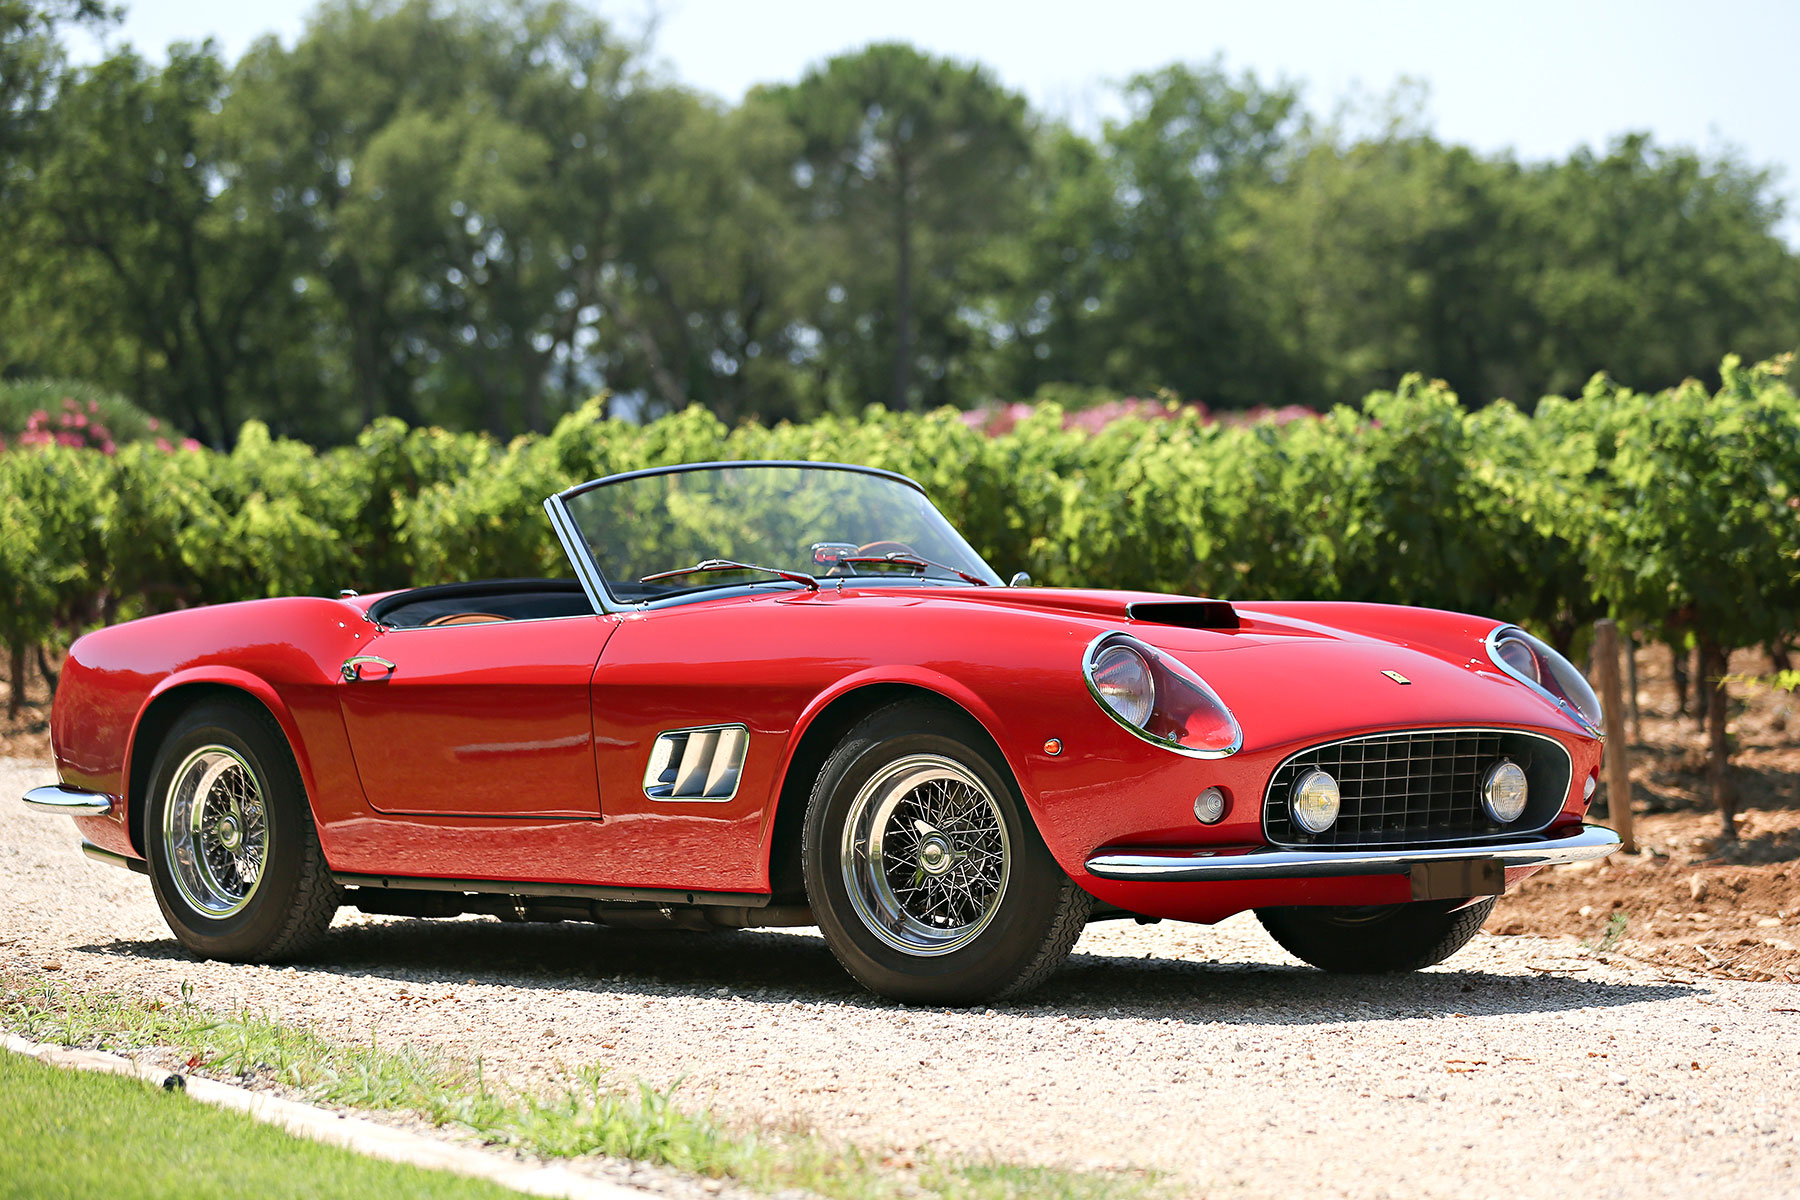 1961 Ferrari 250 GT SWB California Spider | Gooding & Co. | Estimate: $18,000,000